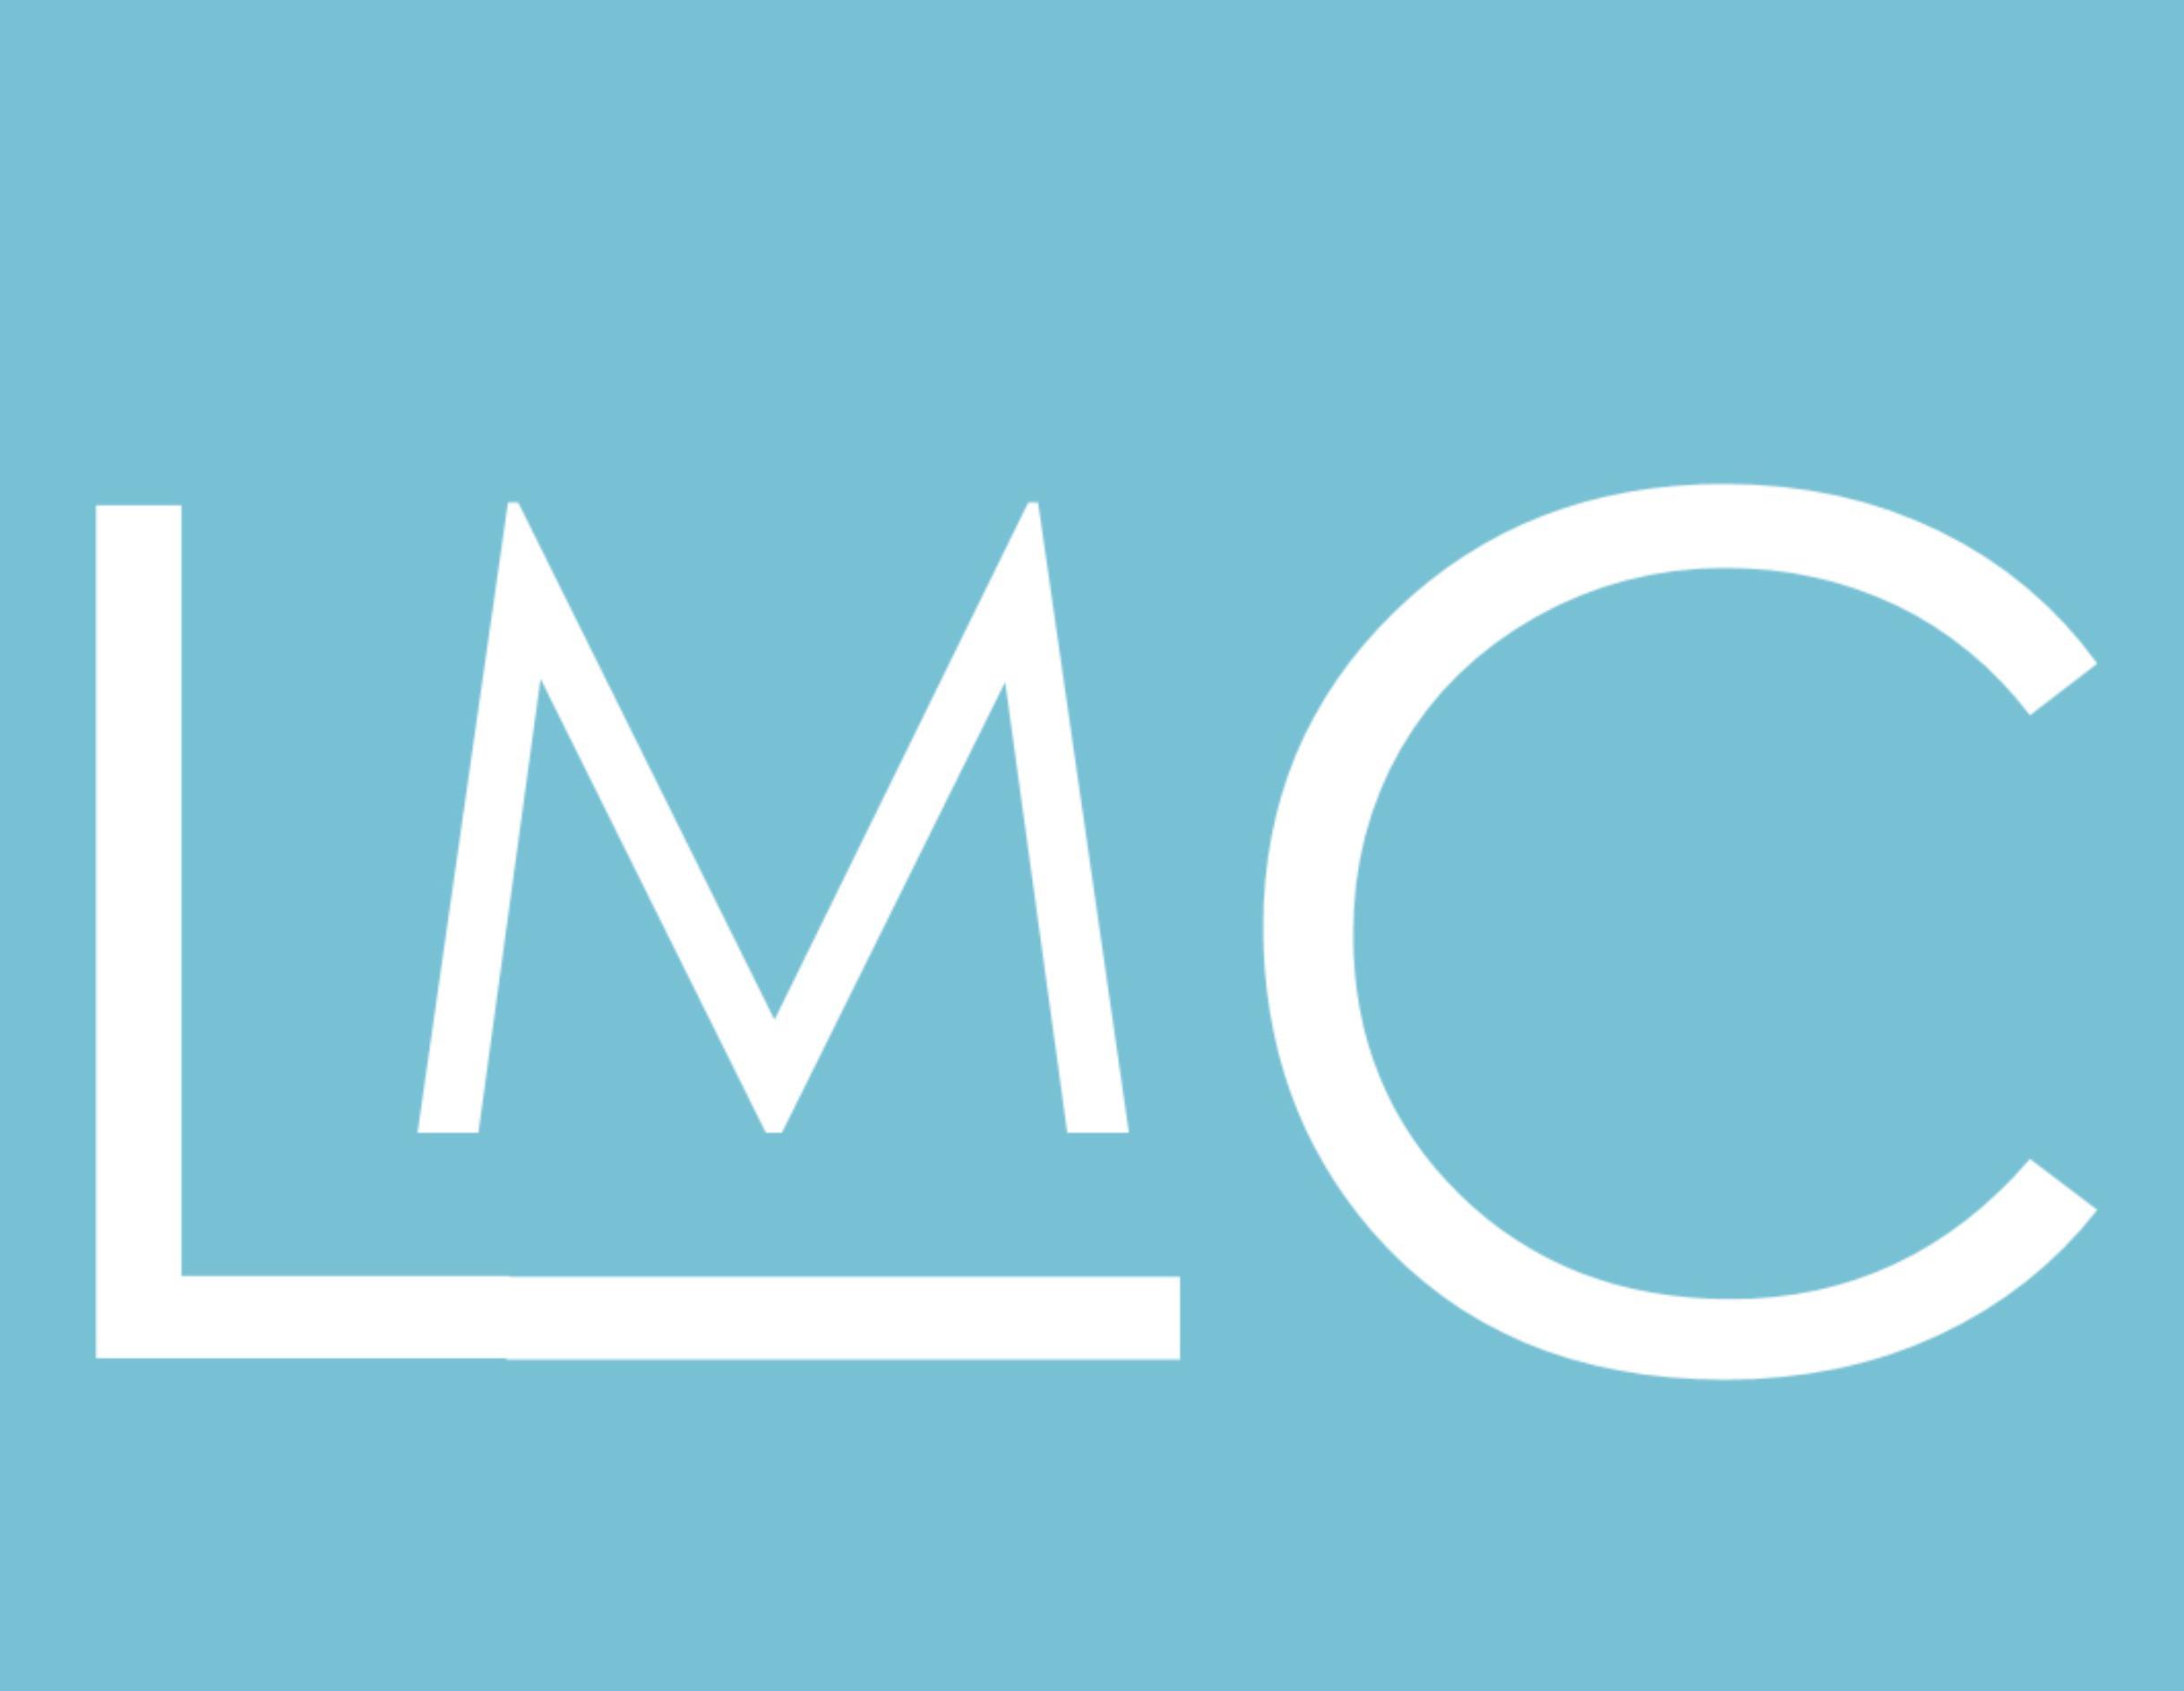 LMC Logo Only